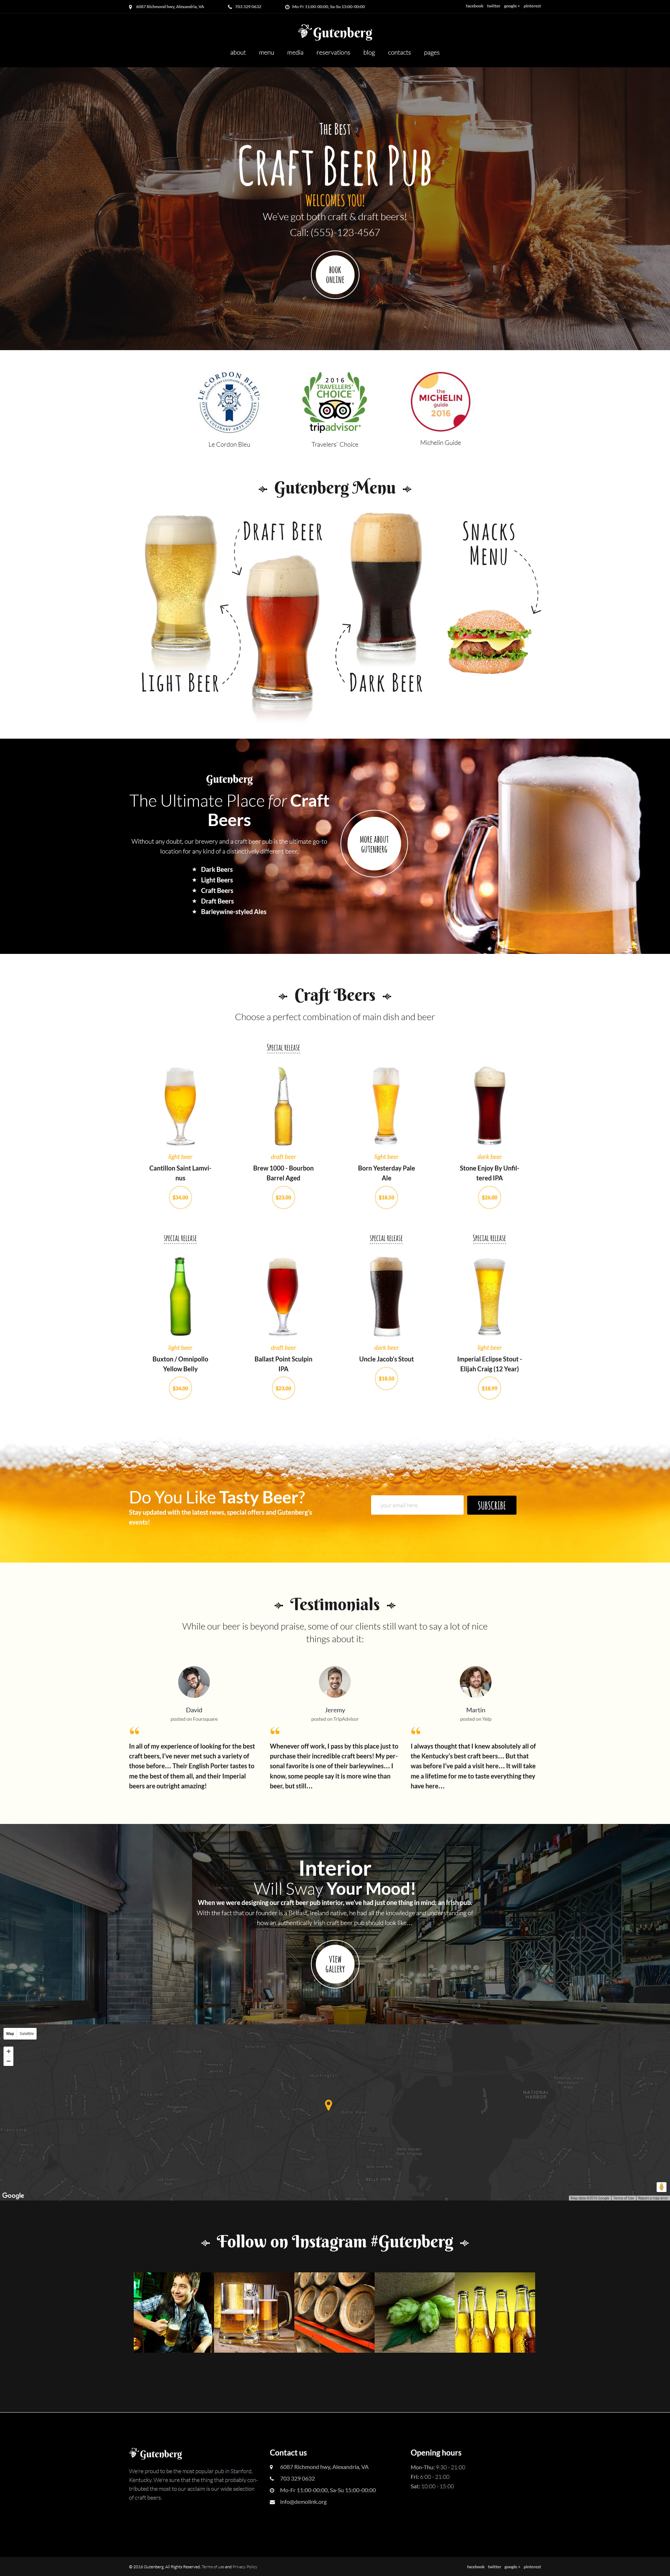 """GutenBerg - Beer Pub and Brewery"" WordPress模板 #59005"